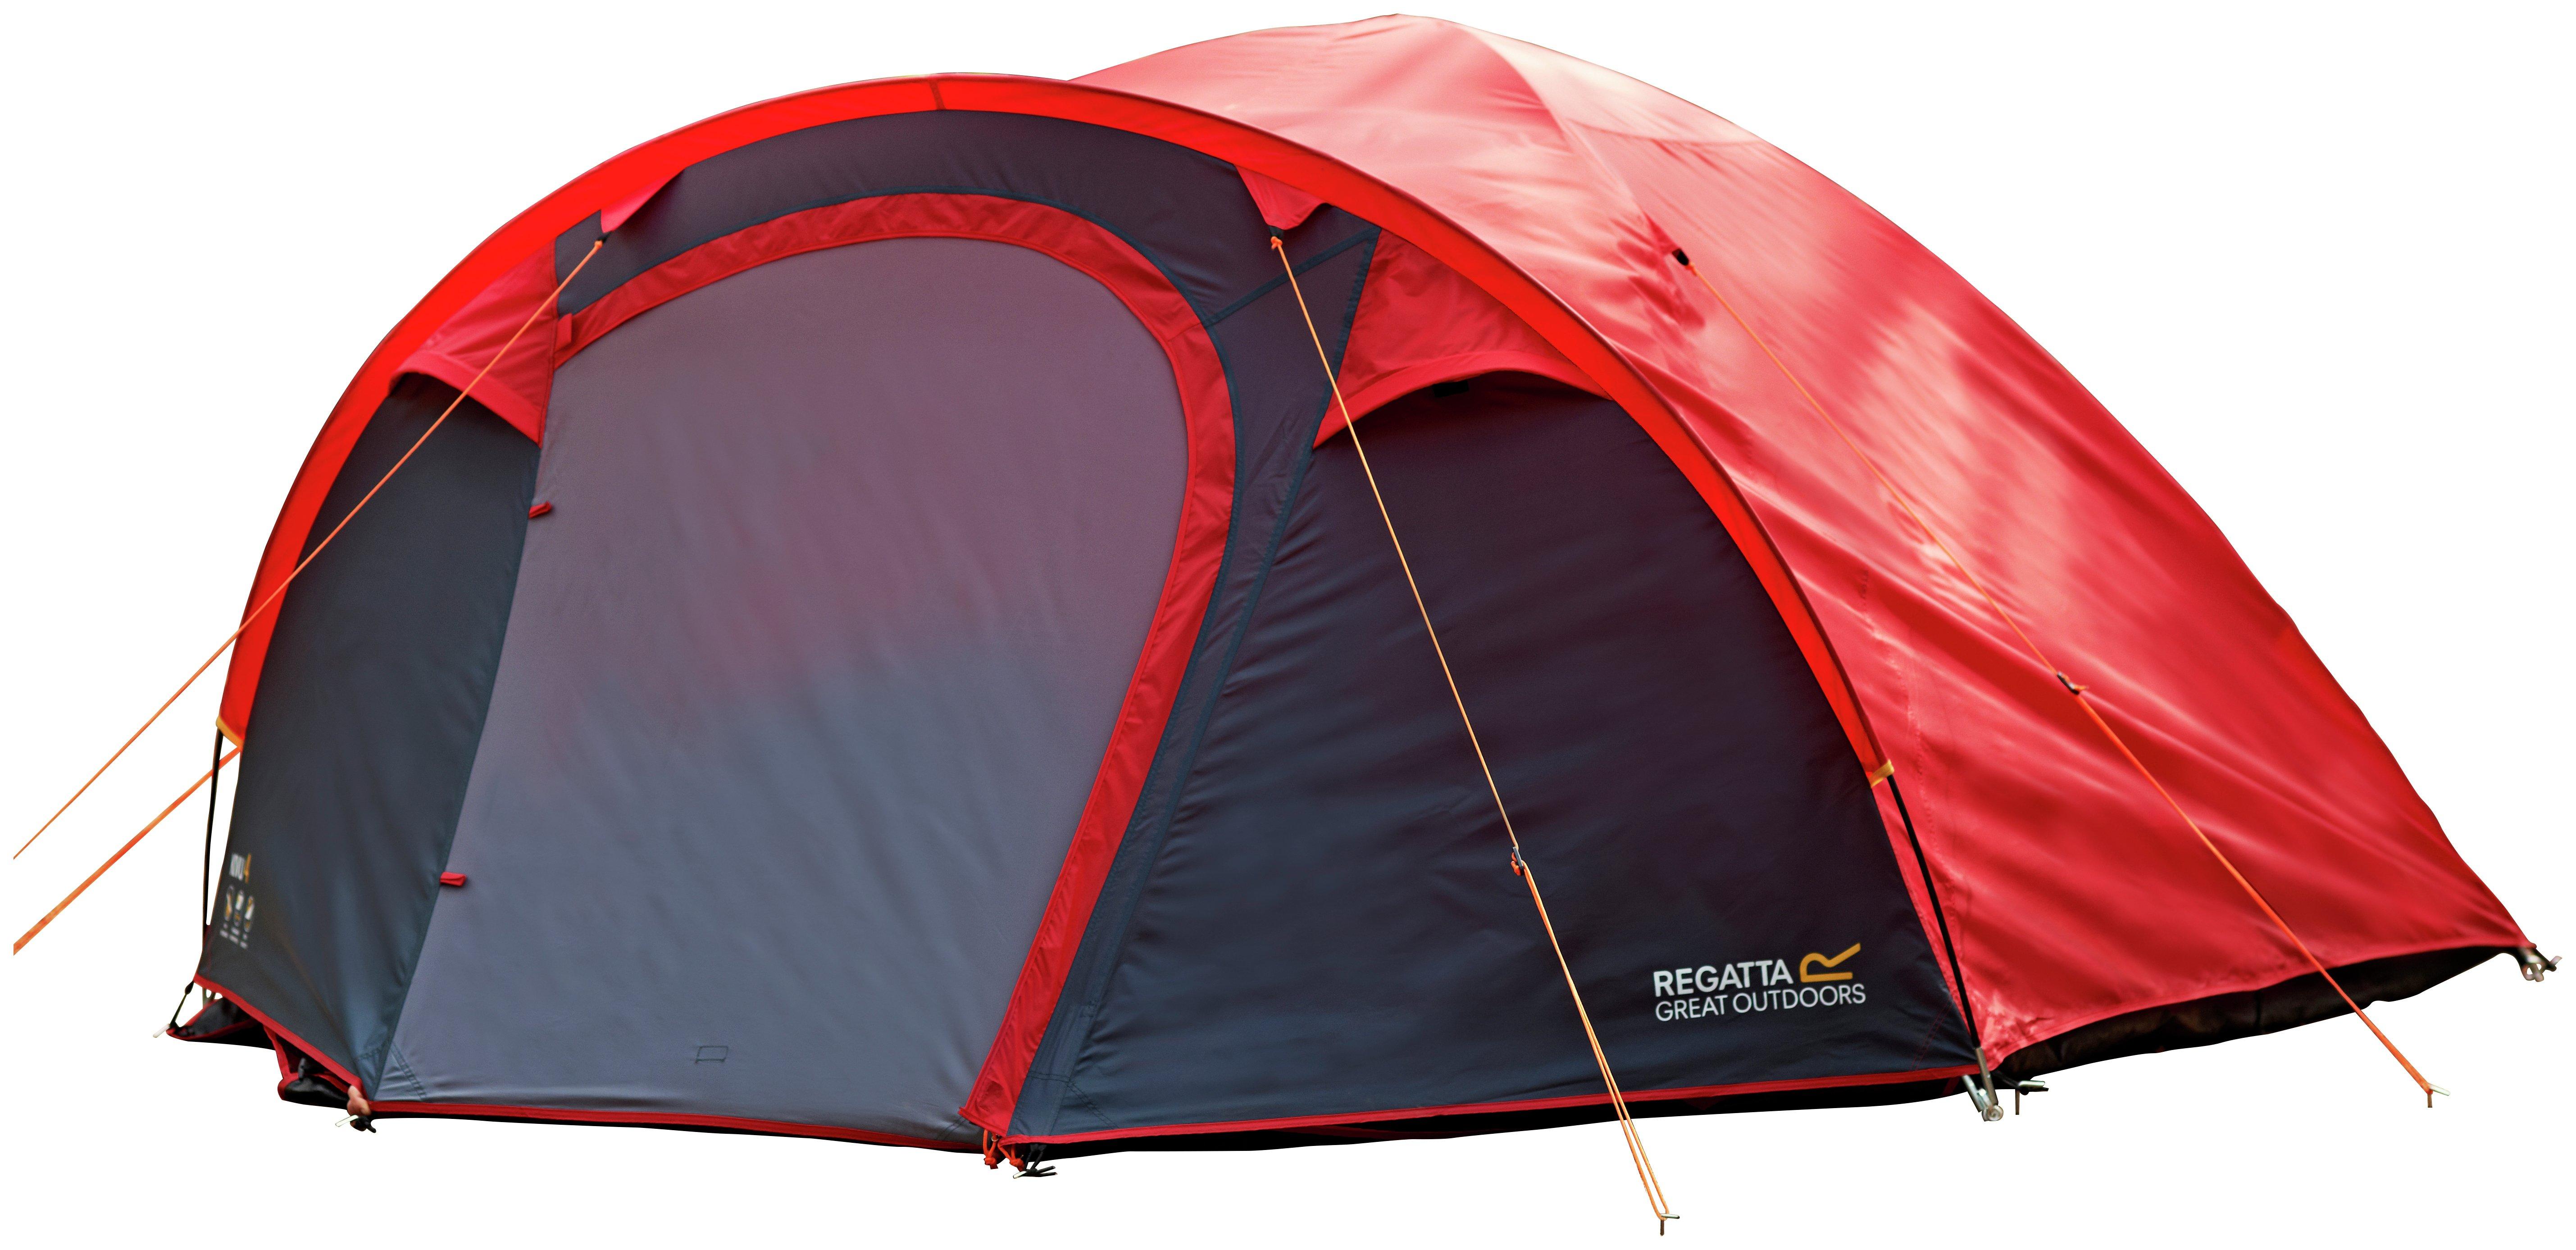 Regatta Kivu 4 Man Dome Tent - Pepper  sc 1 st  Argos & Tents | Argos